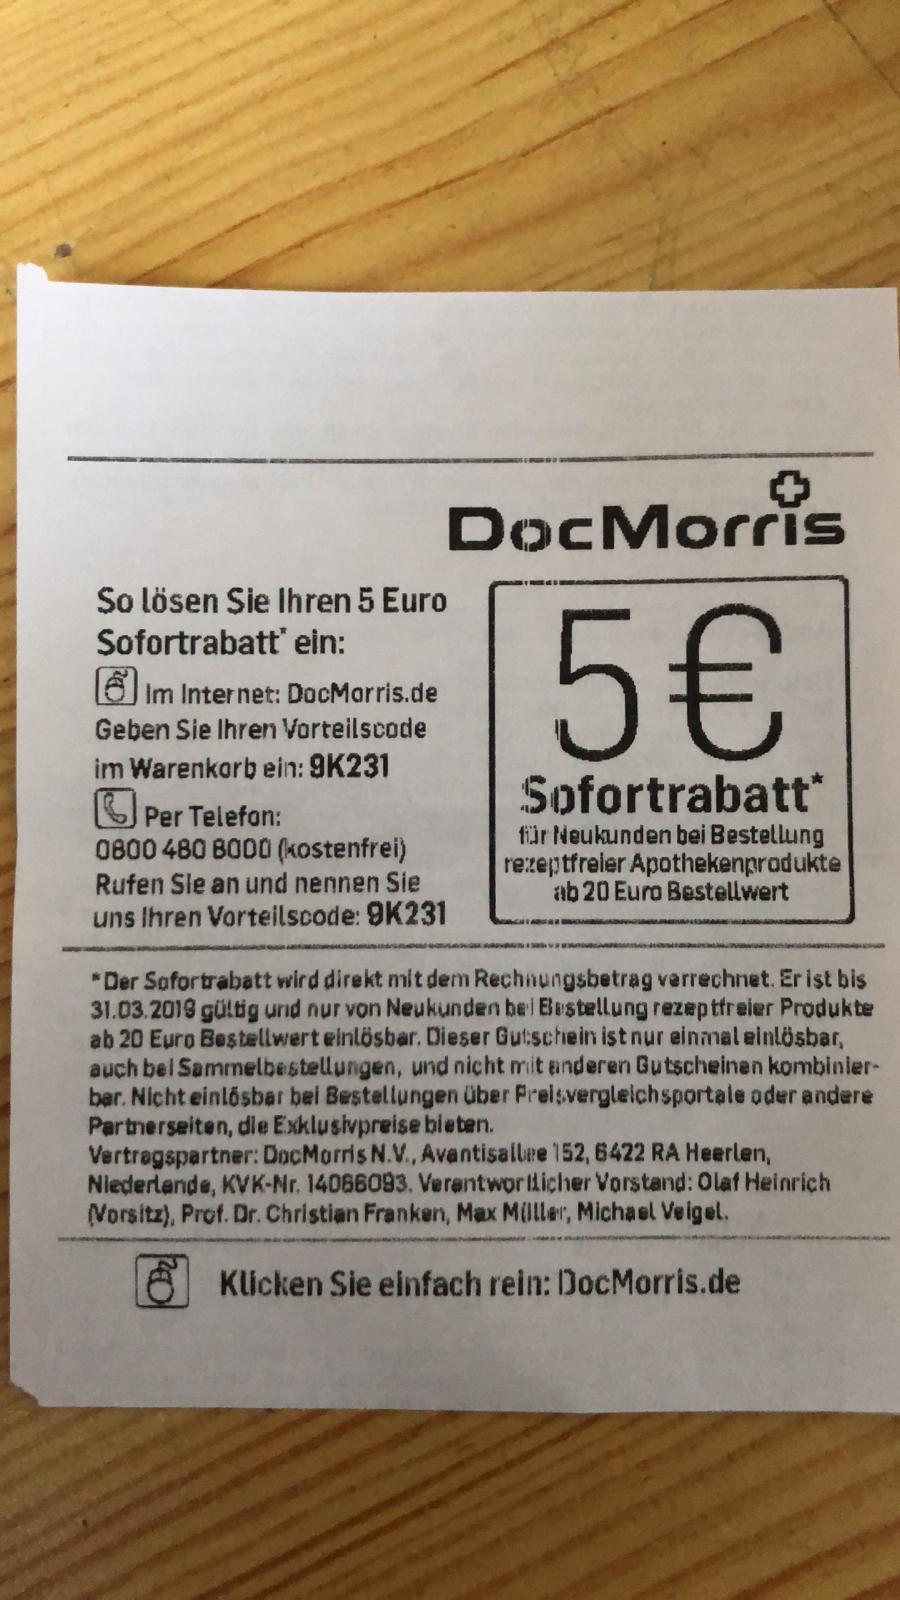 5€ Rabatt - DocMorris Versandapotheke - MBW 20 Euro - nur für Neukunden